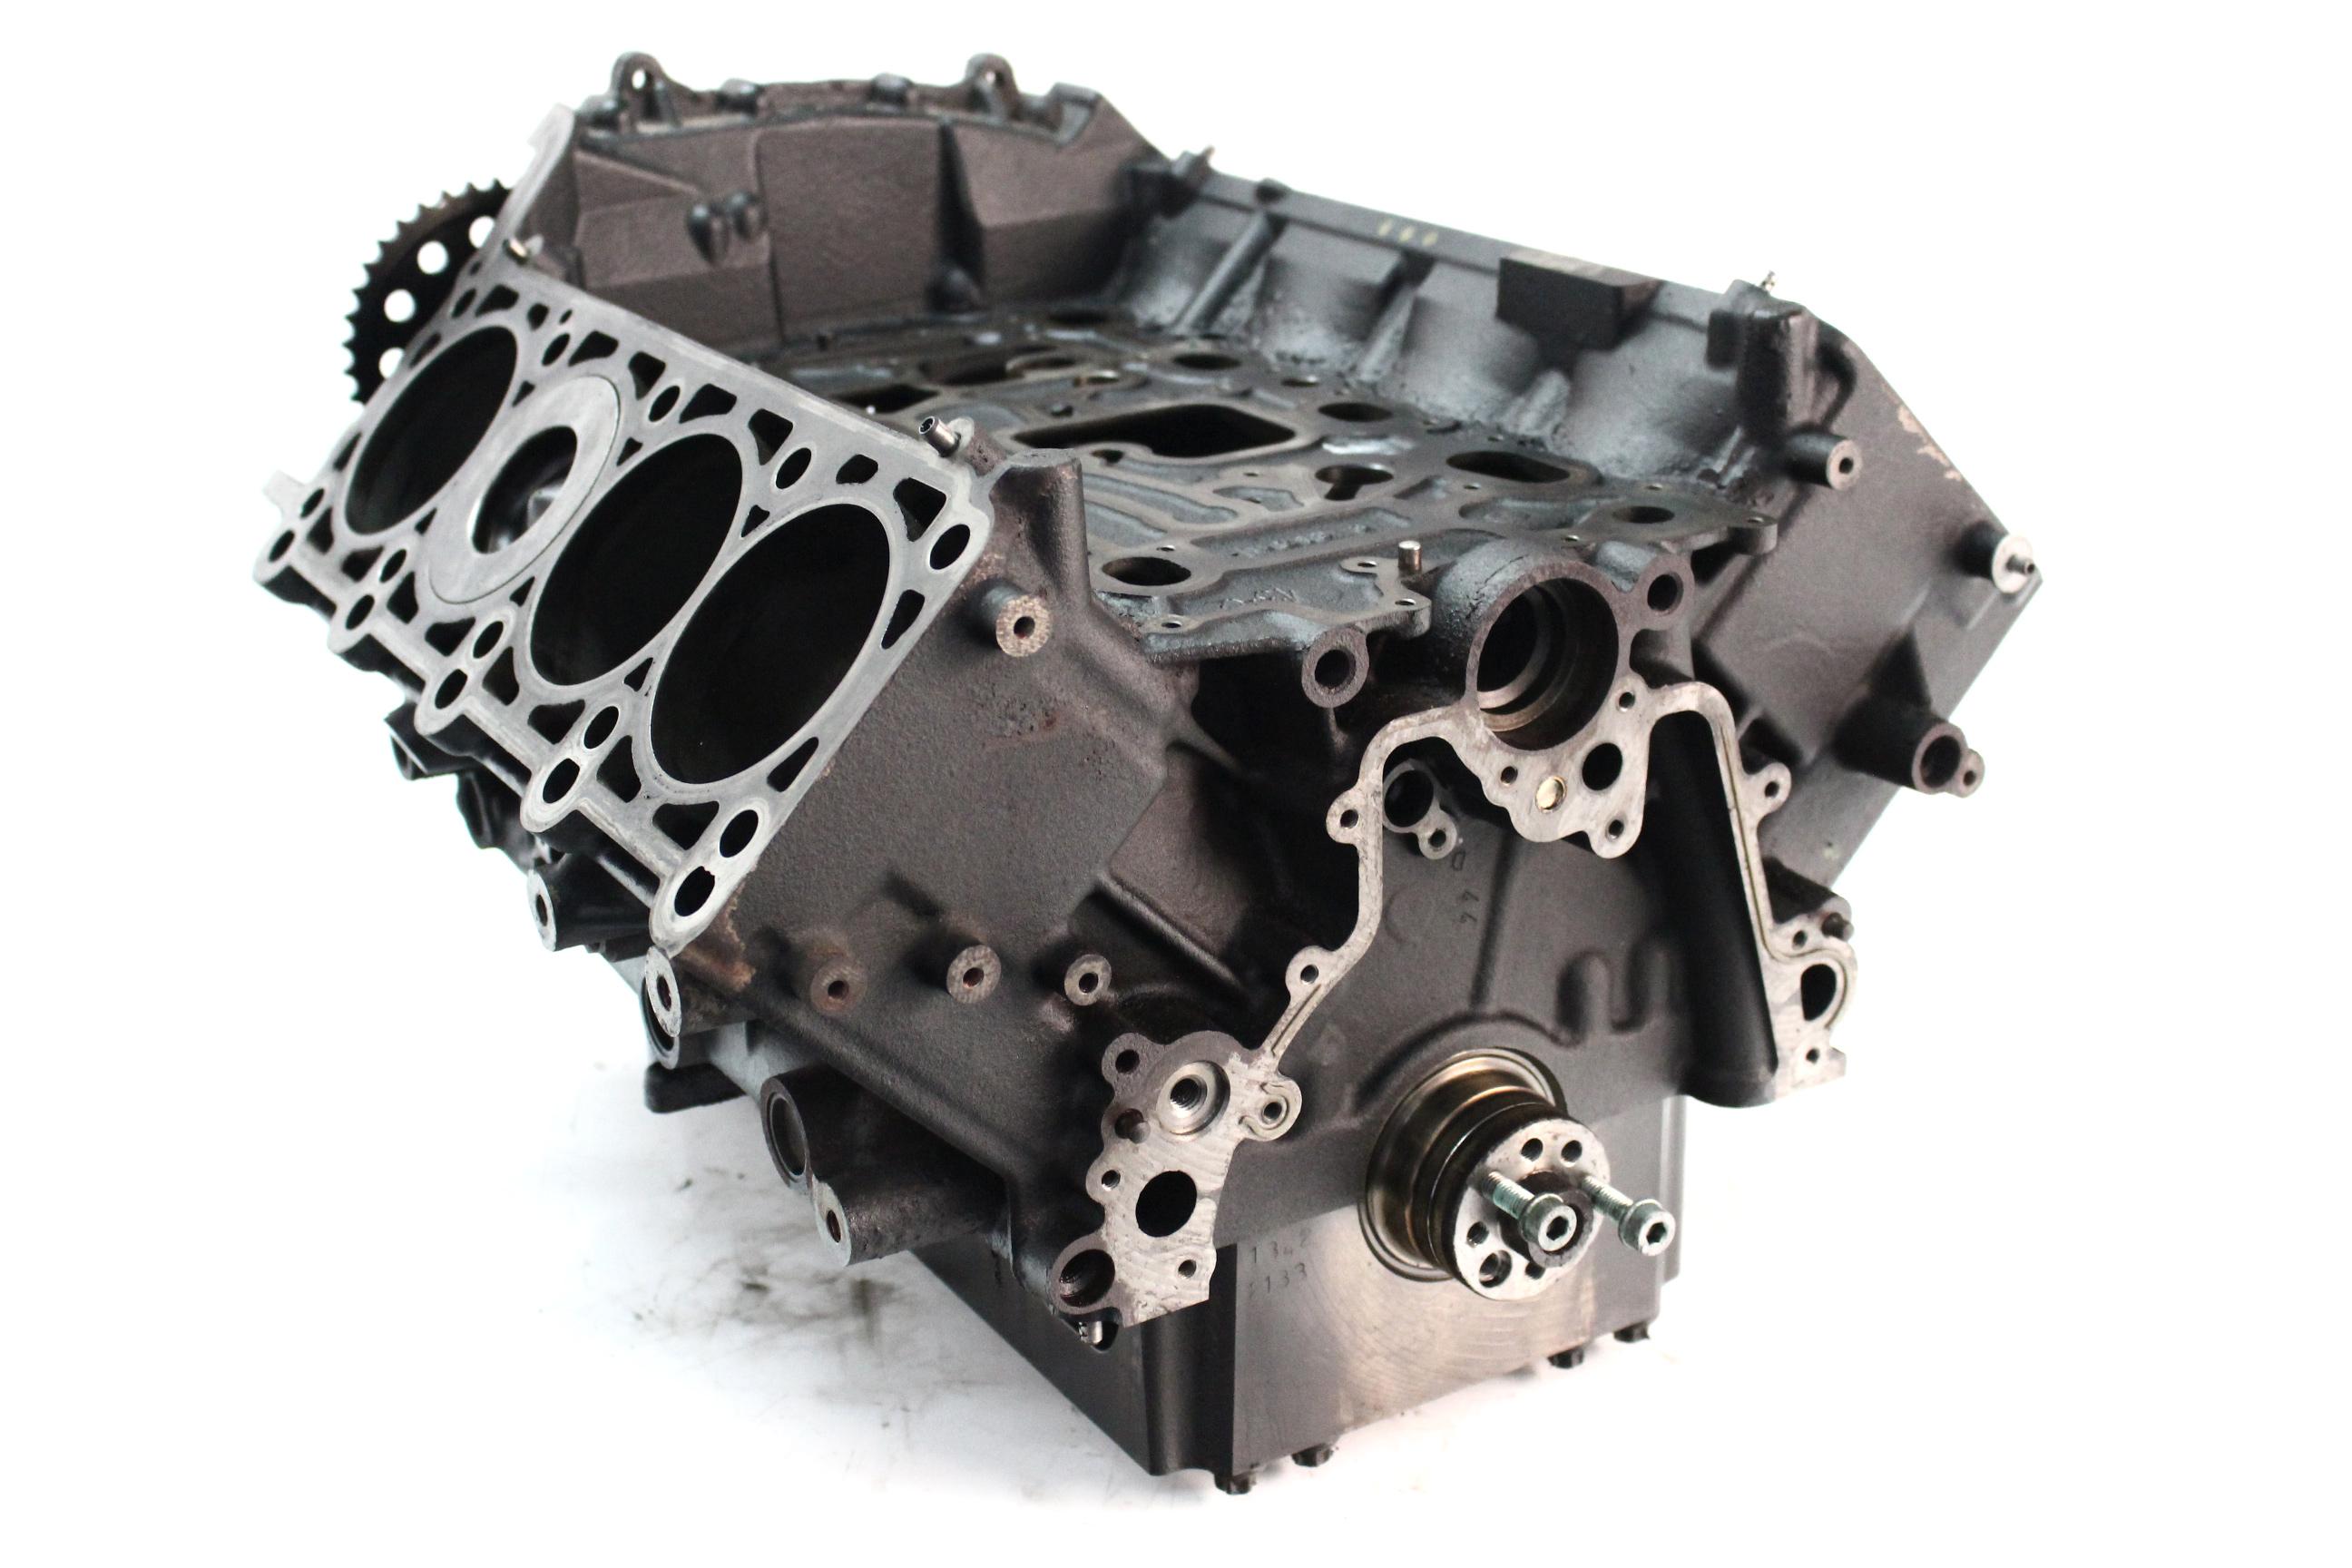 Bloc moteur Vilebrequin Piston Audi A8 4E 4,0 TDI Diesel ASE 275 CH 202 KW